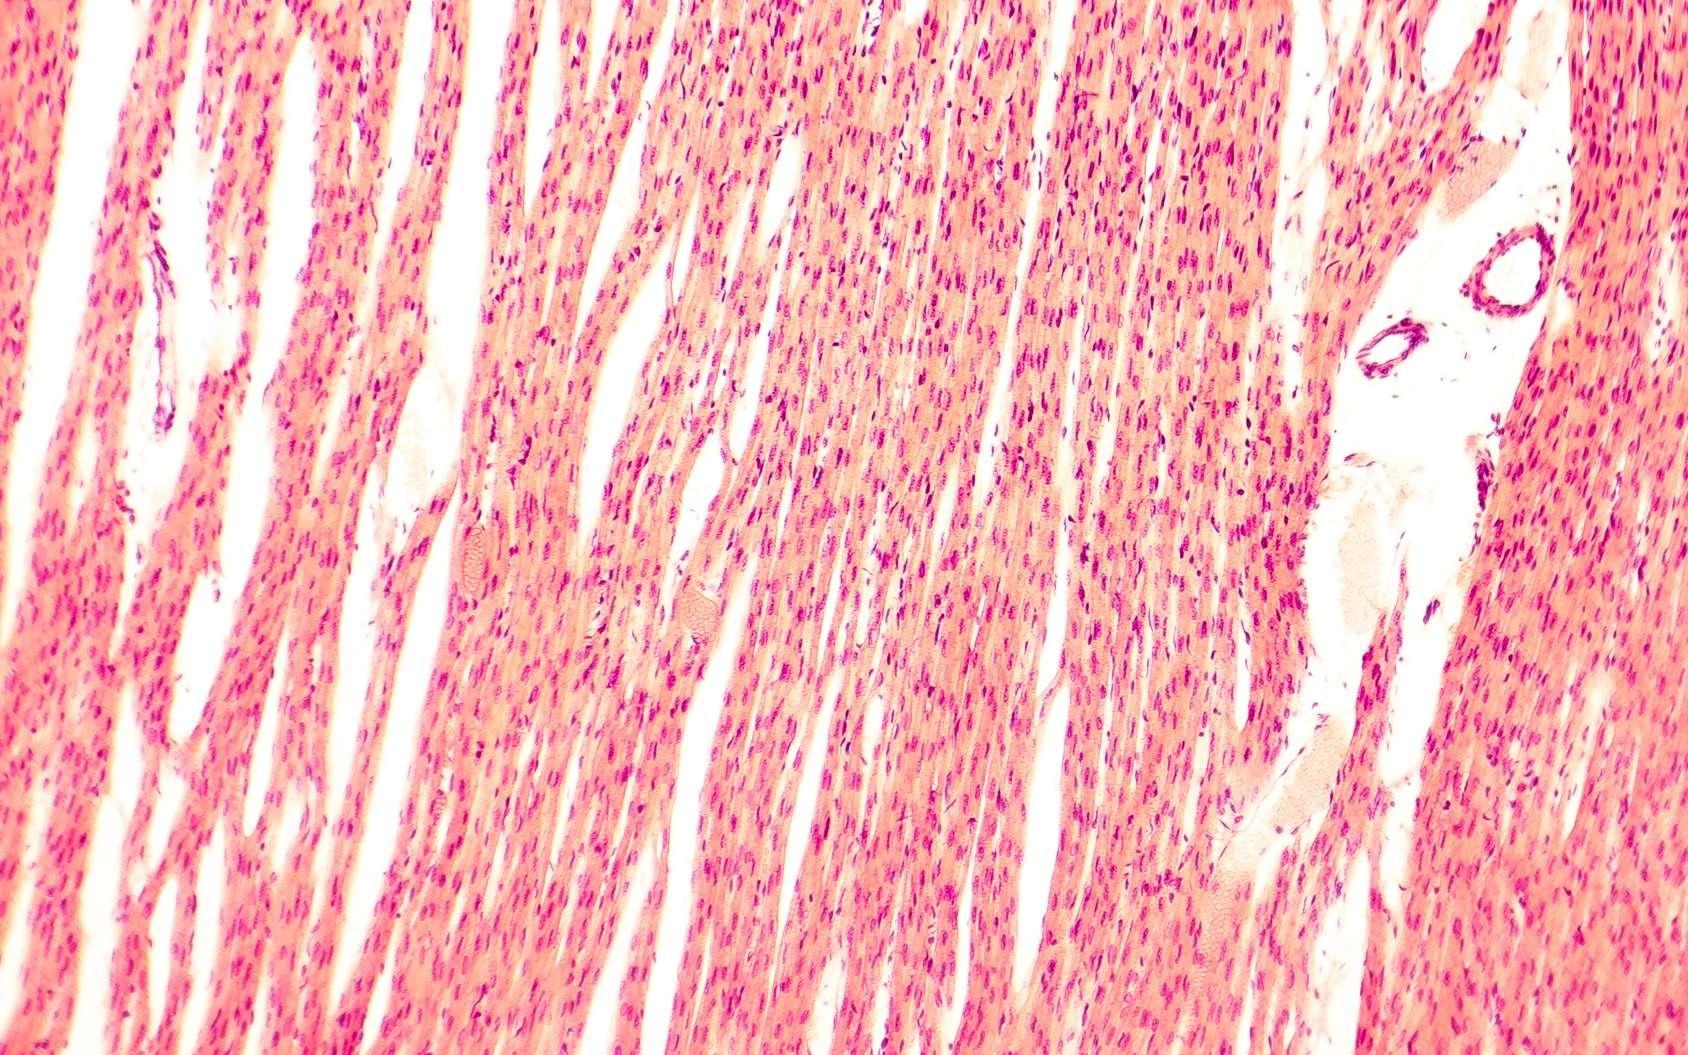 Les cardiomyocytes sont les cellules musculaires cardiaques. © Kateryna_Kon, Fotolia